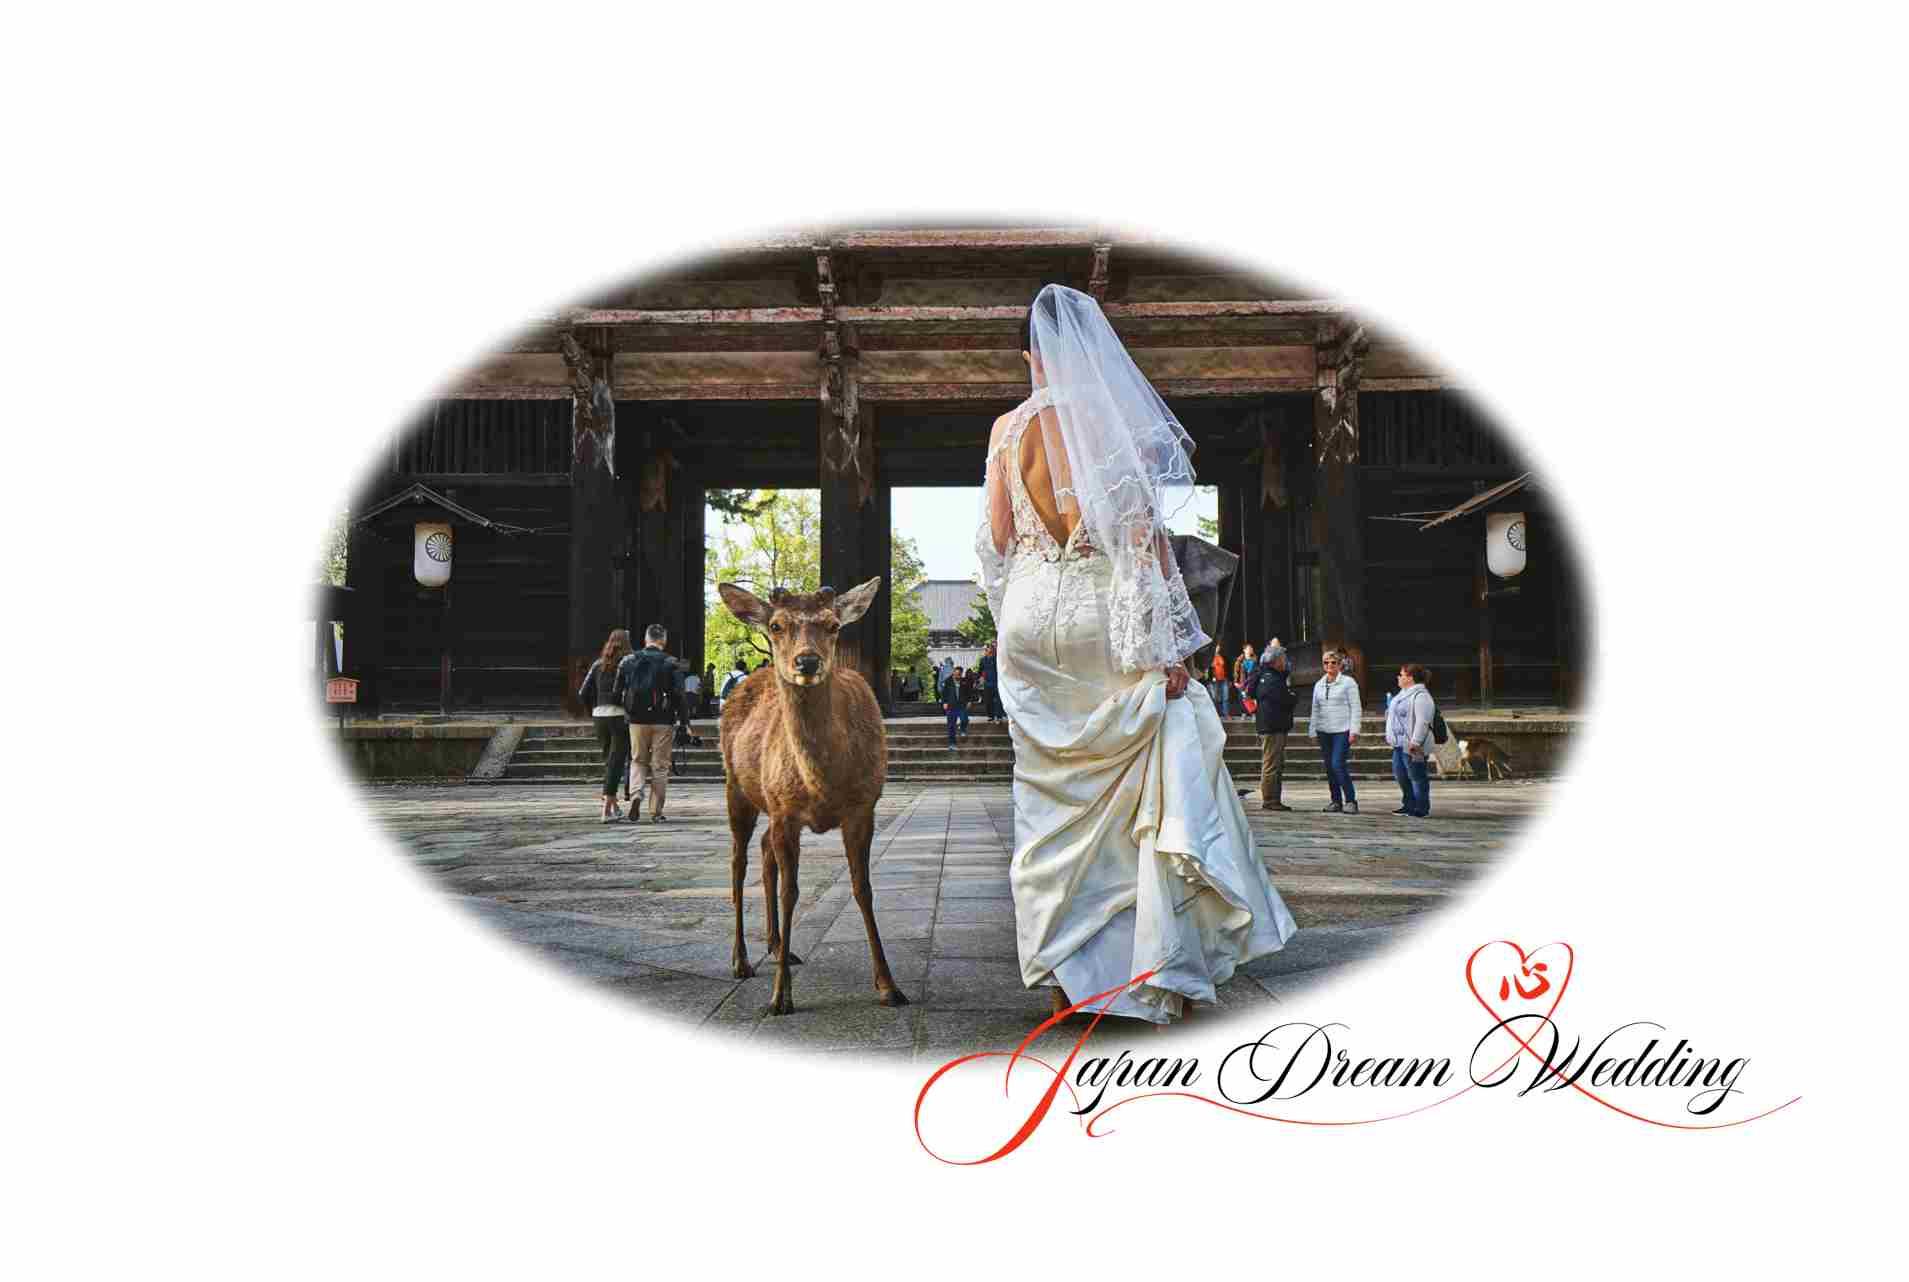 Japan Dream Wedding - Wedding Party Travel